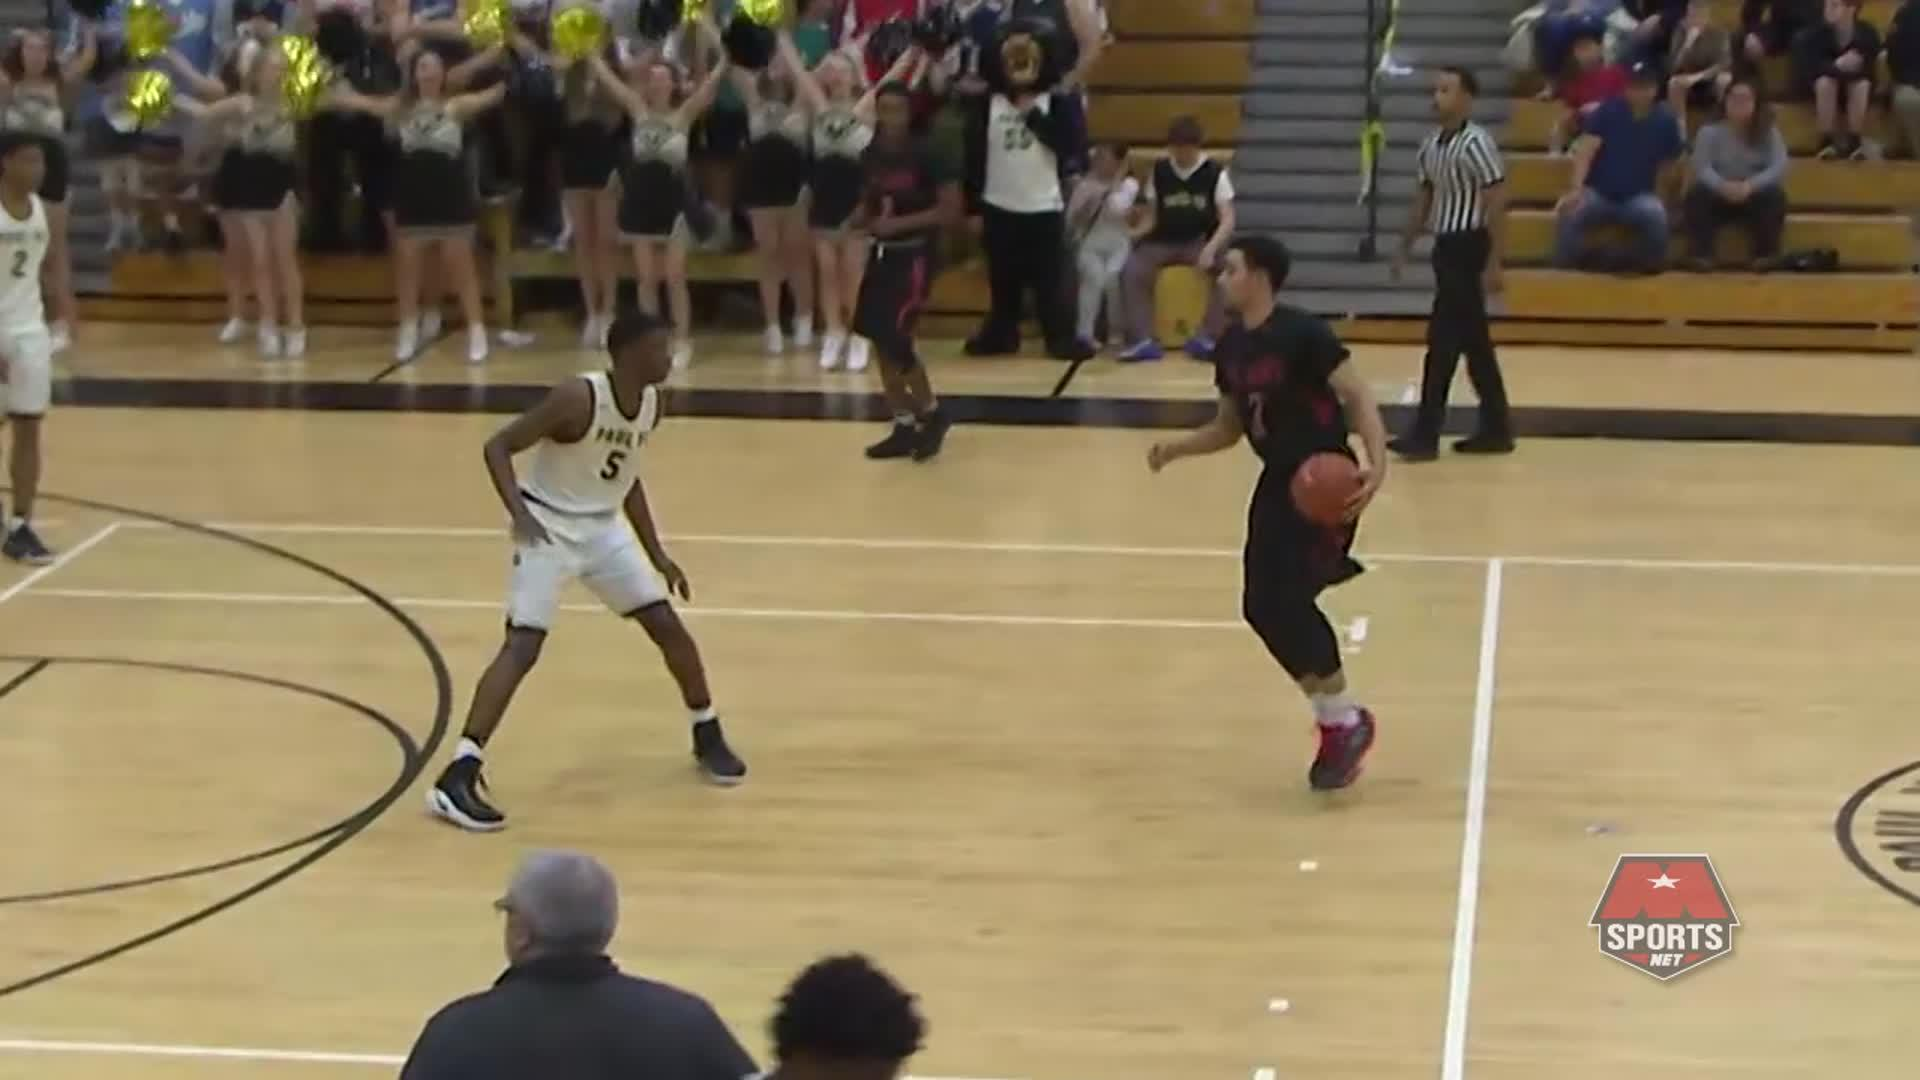 High School Basketball Showcase: St. John's vs. Paul VI Boys 1/24/17